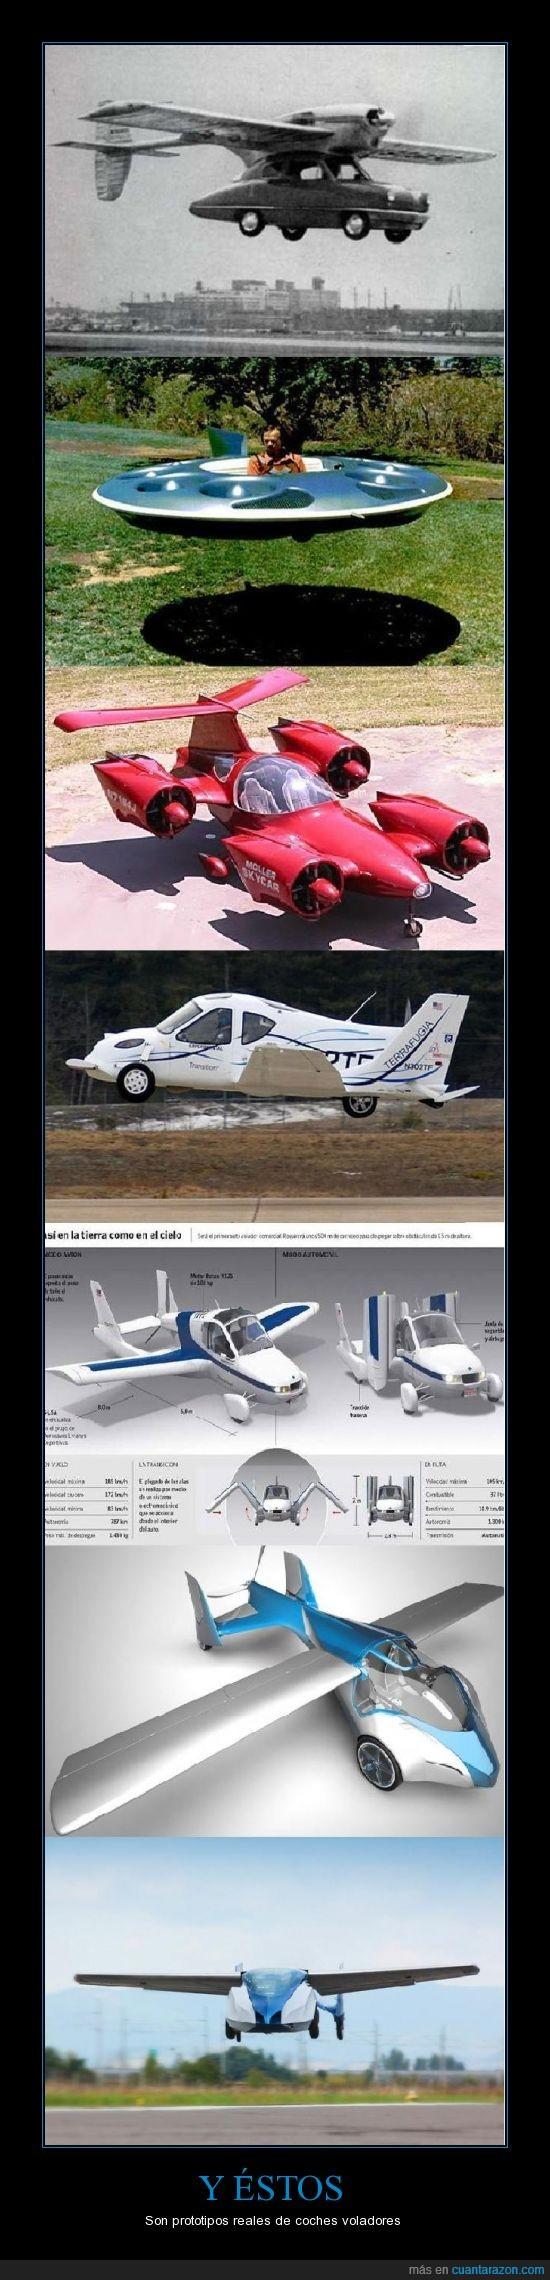 actualidad,aeromobil,alas,Autos voladores,avion,carros,coches,motor,pedo con cada sabor a mermelada :3,prototipos,volar